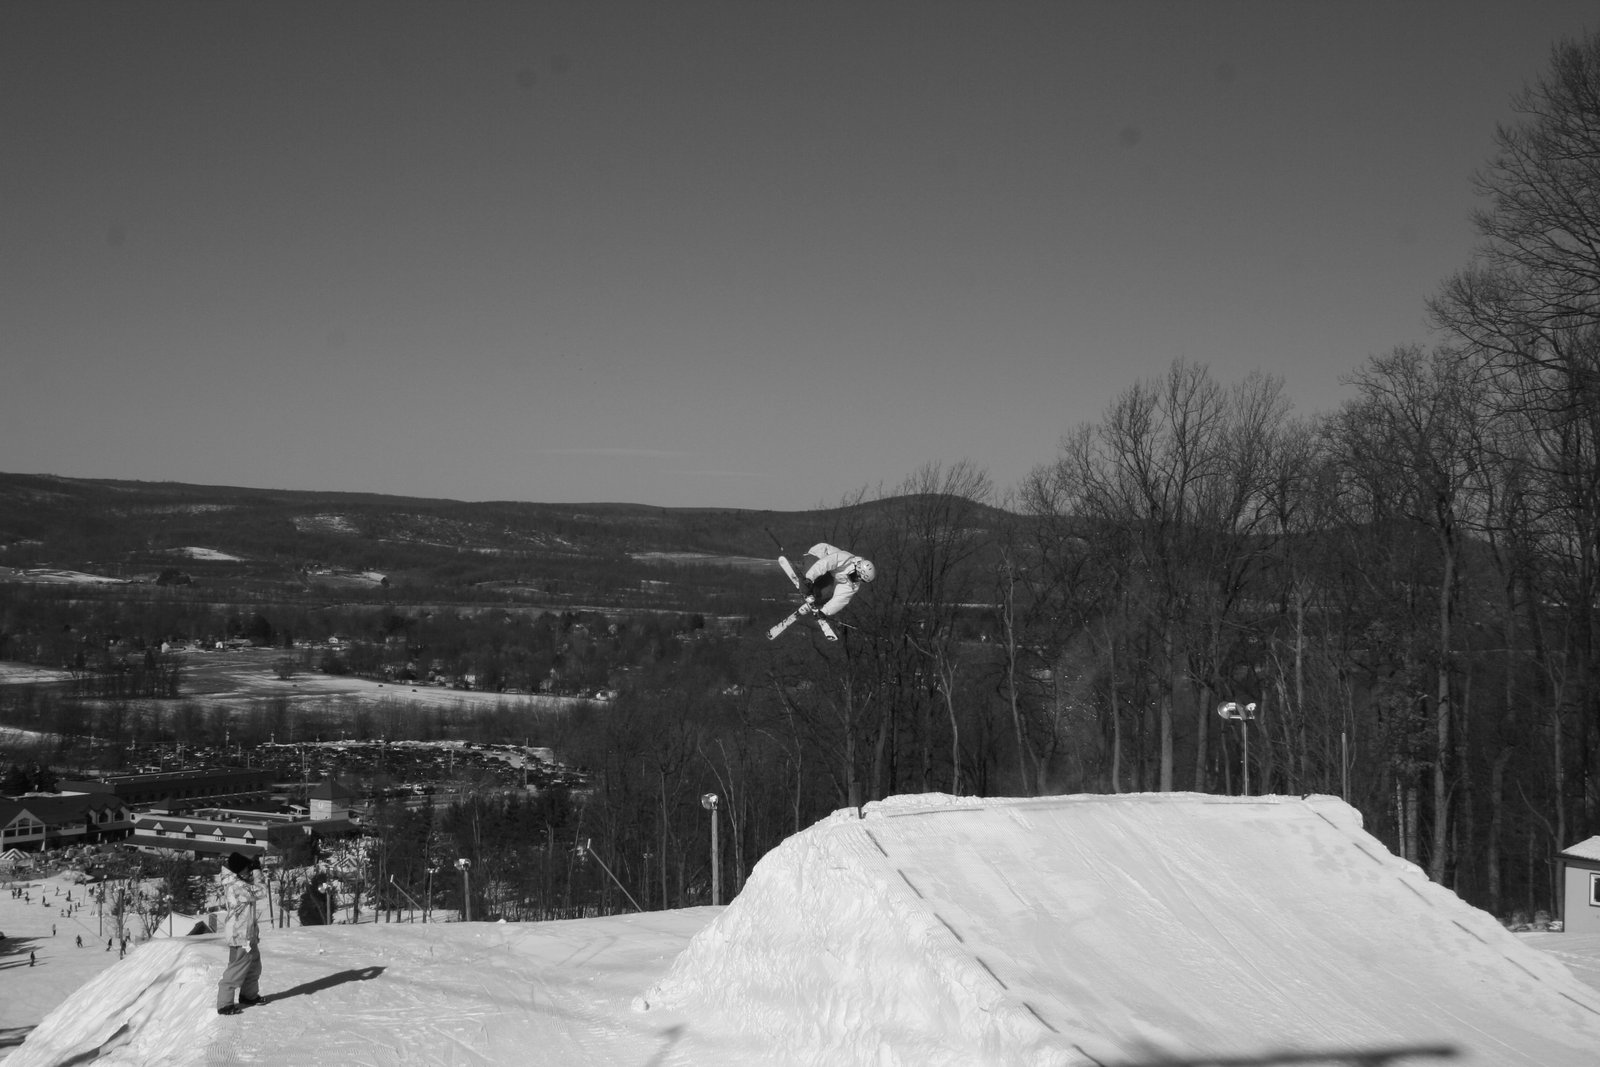 Liberty Jump